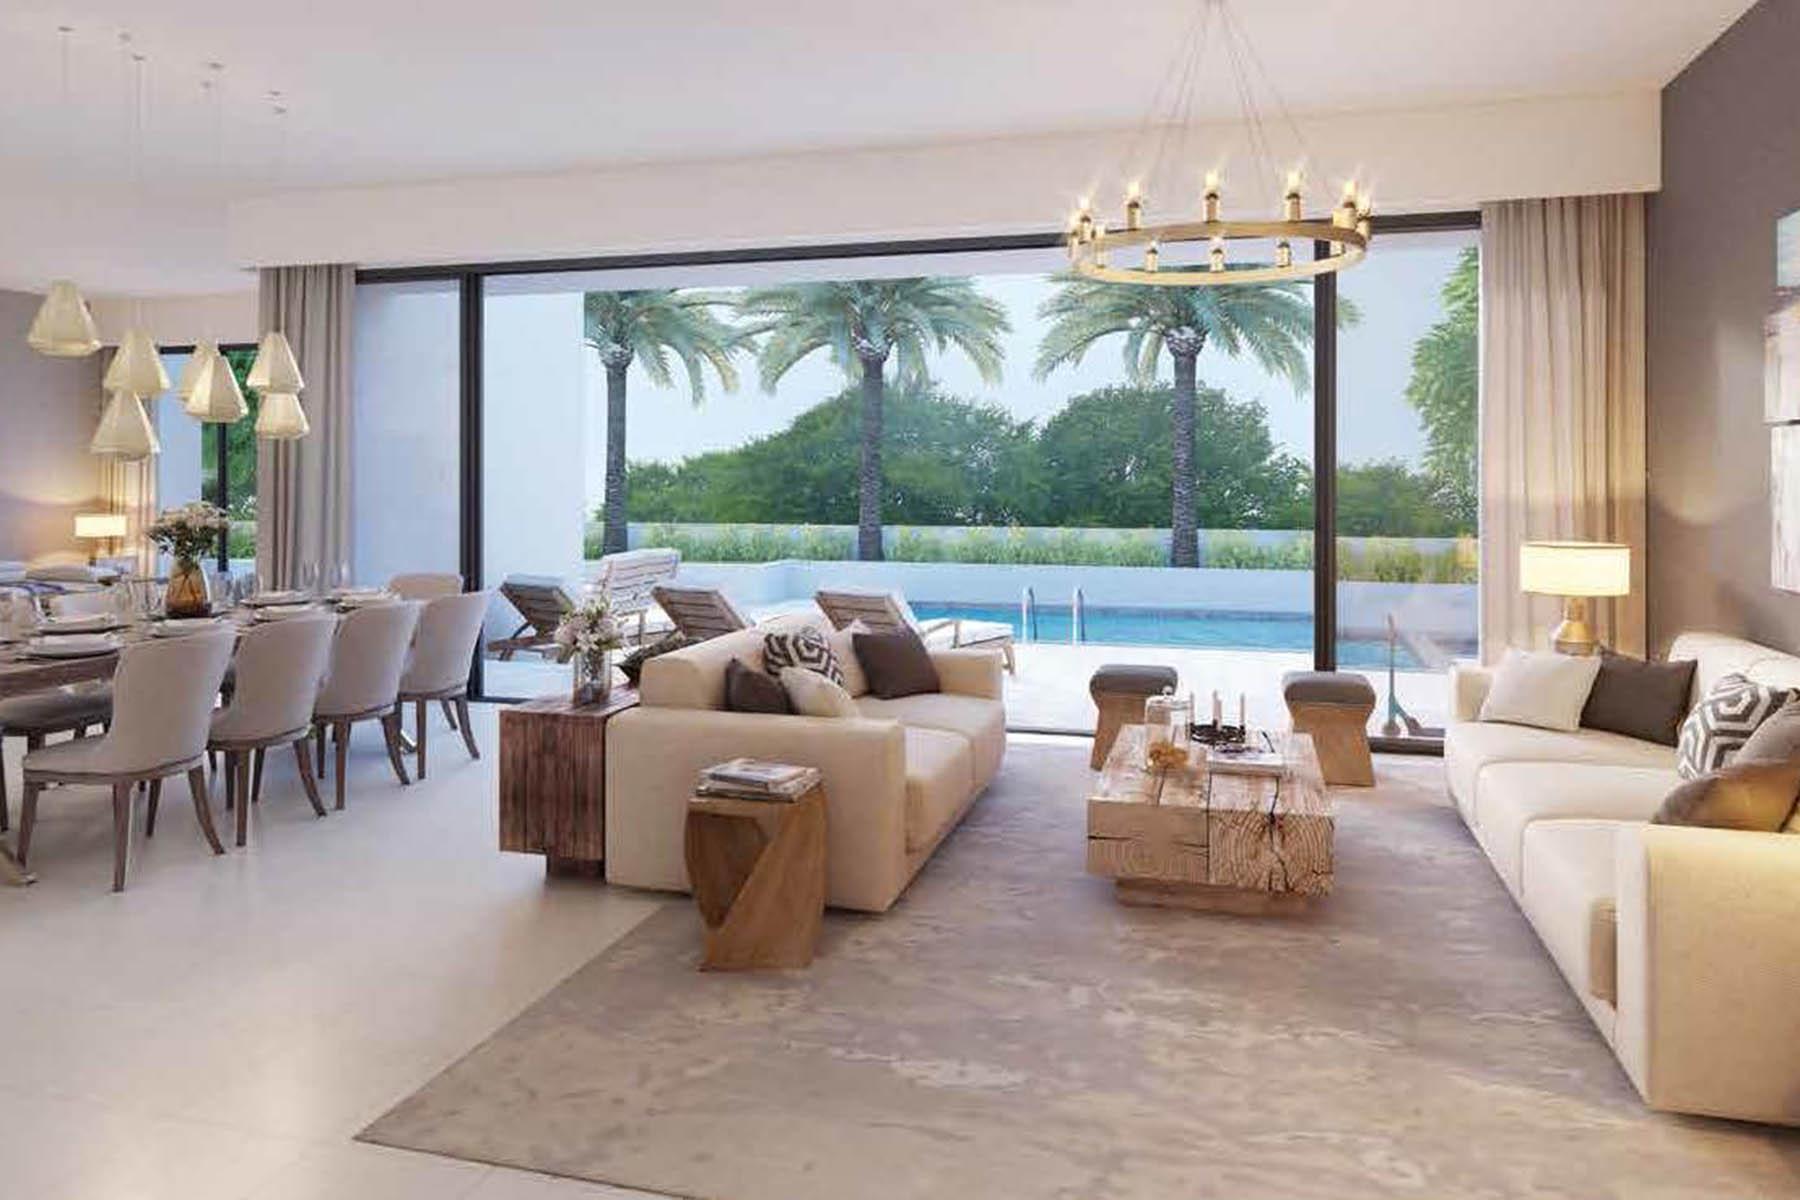 Independent Villa in Sidra   Dubai Hills Estate